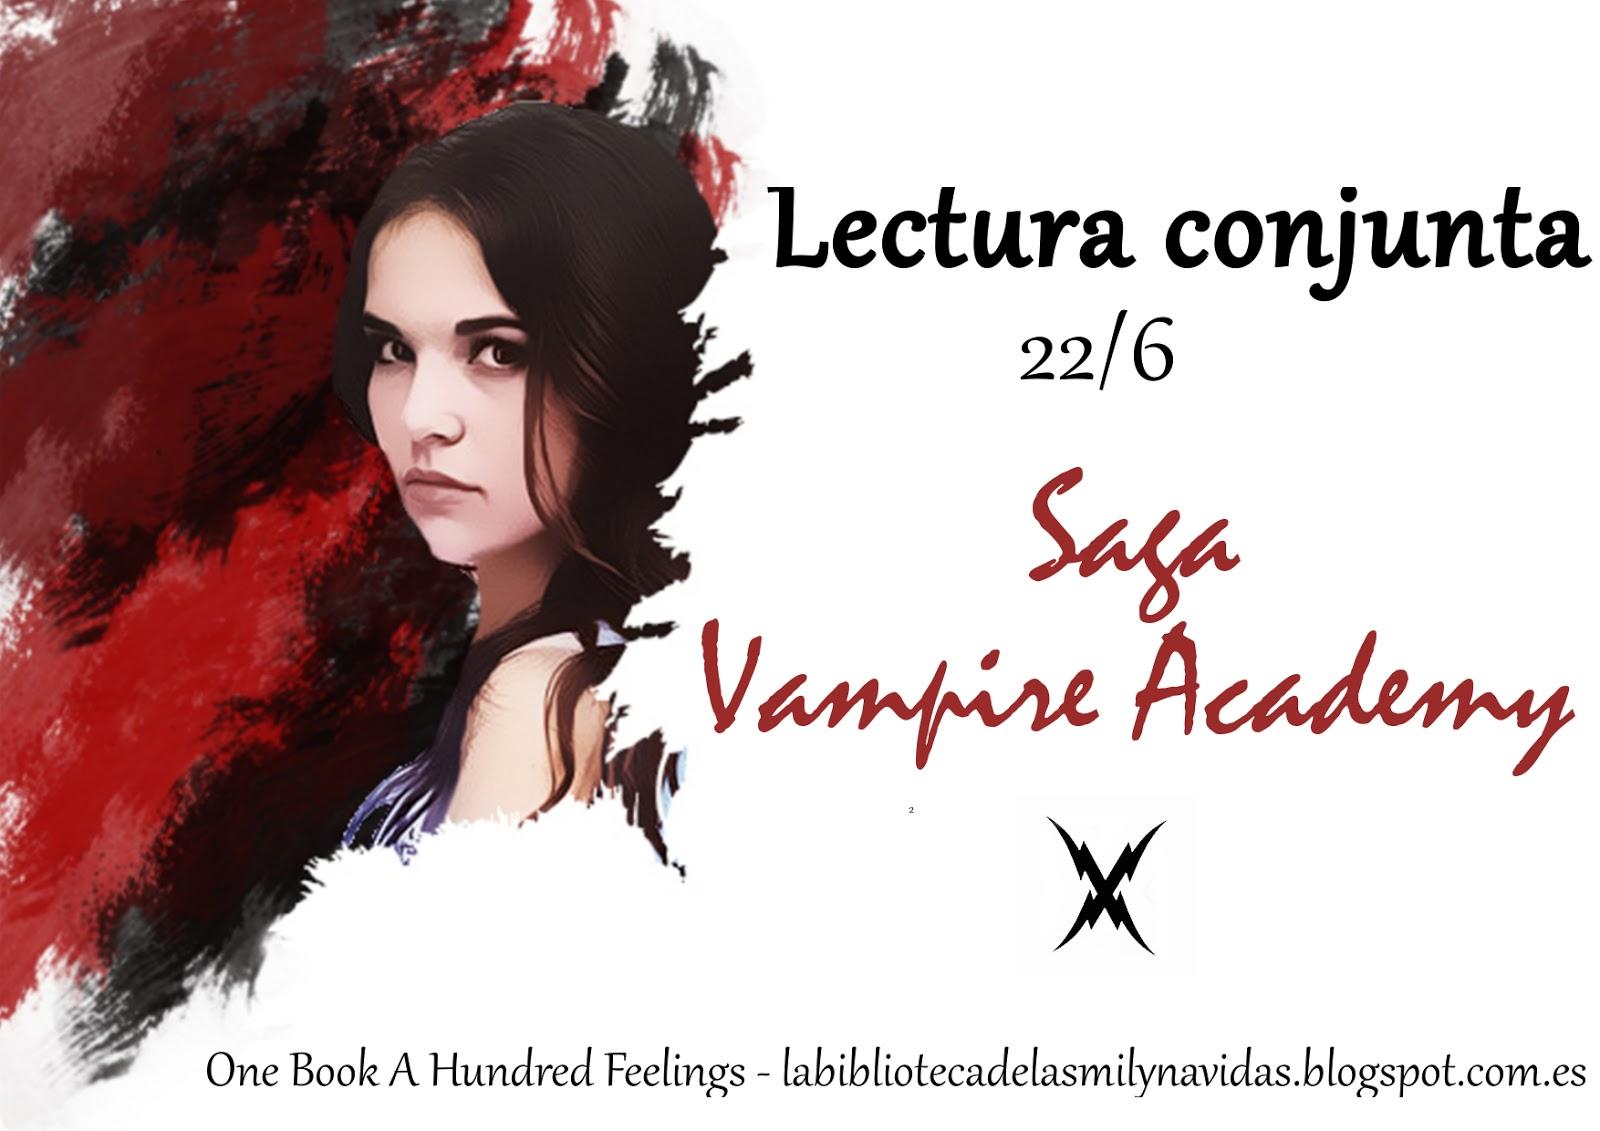 http://labibliotecadelasmilyunavidas.blogspot.com.es/2015/06/lectura-conjunta-vampire-academy-st.html